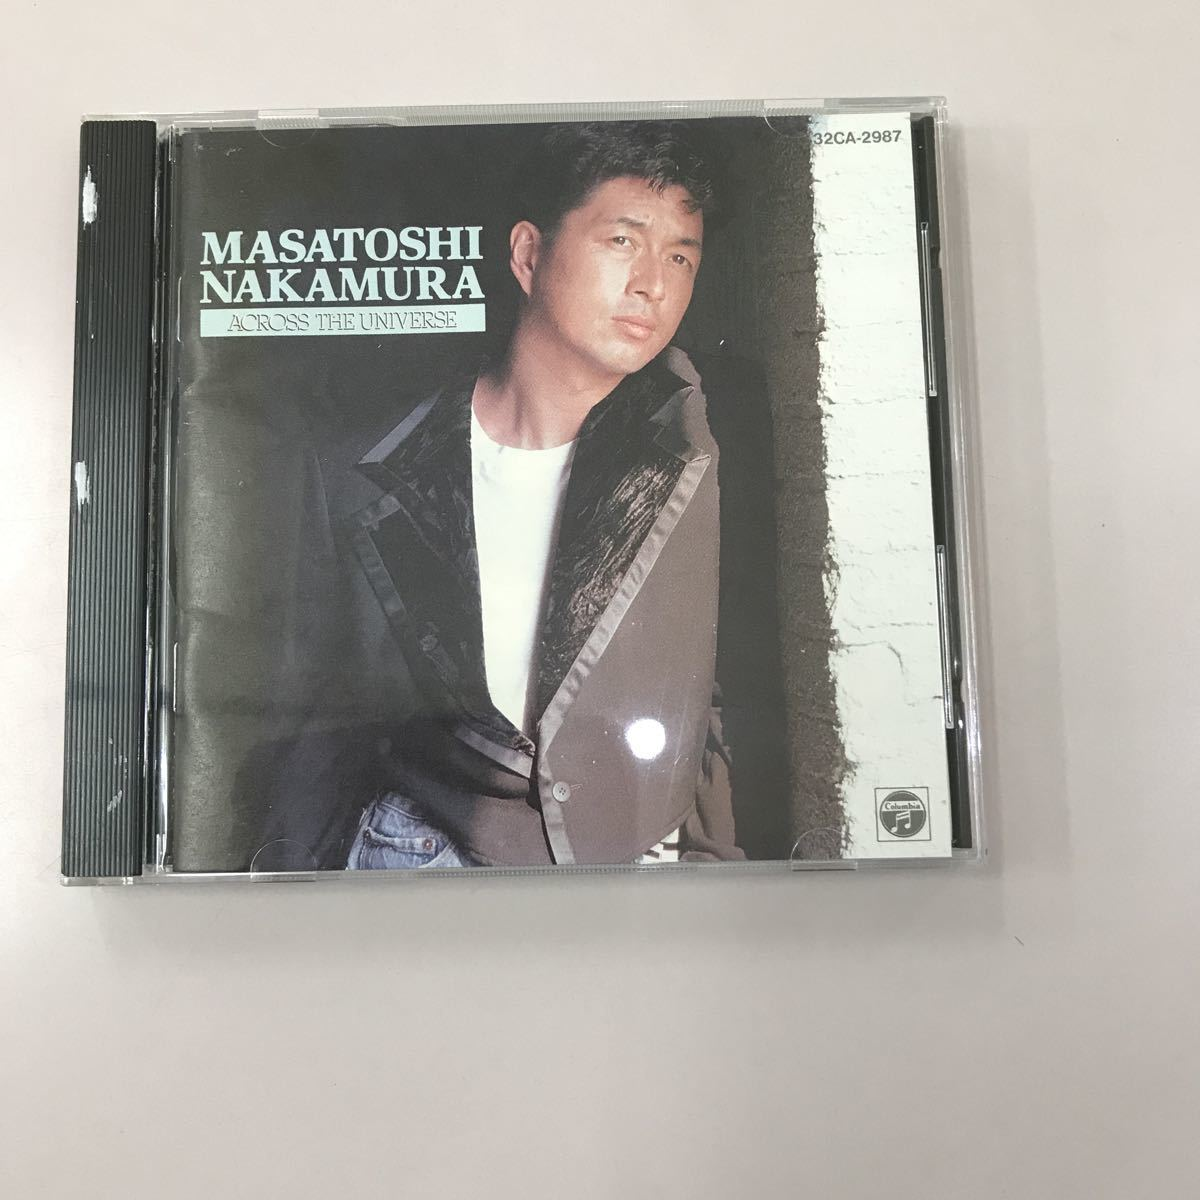 CD 中古☆【邦楽】中村雅俊 アクロス ザ ユニバース